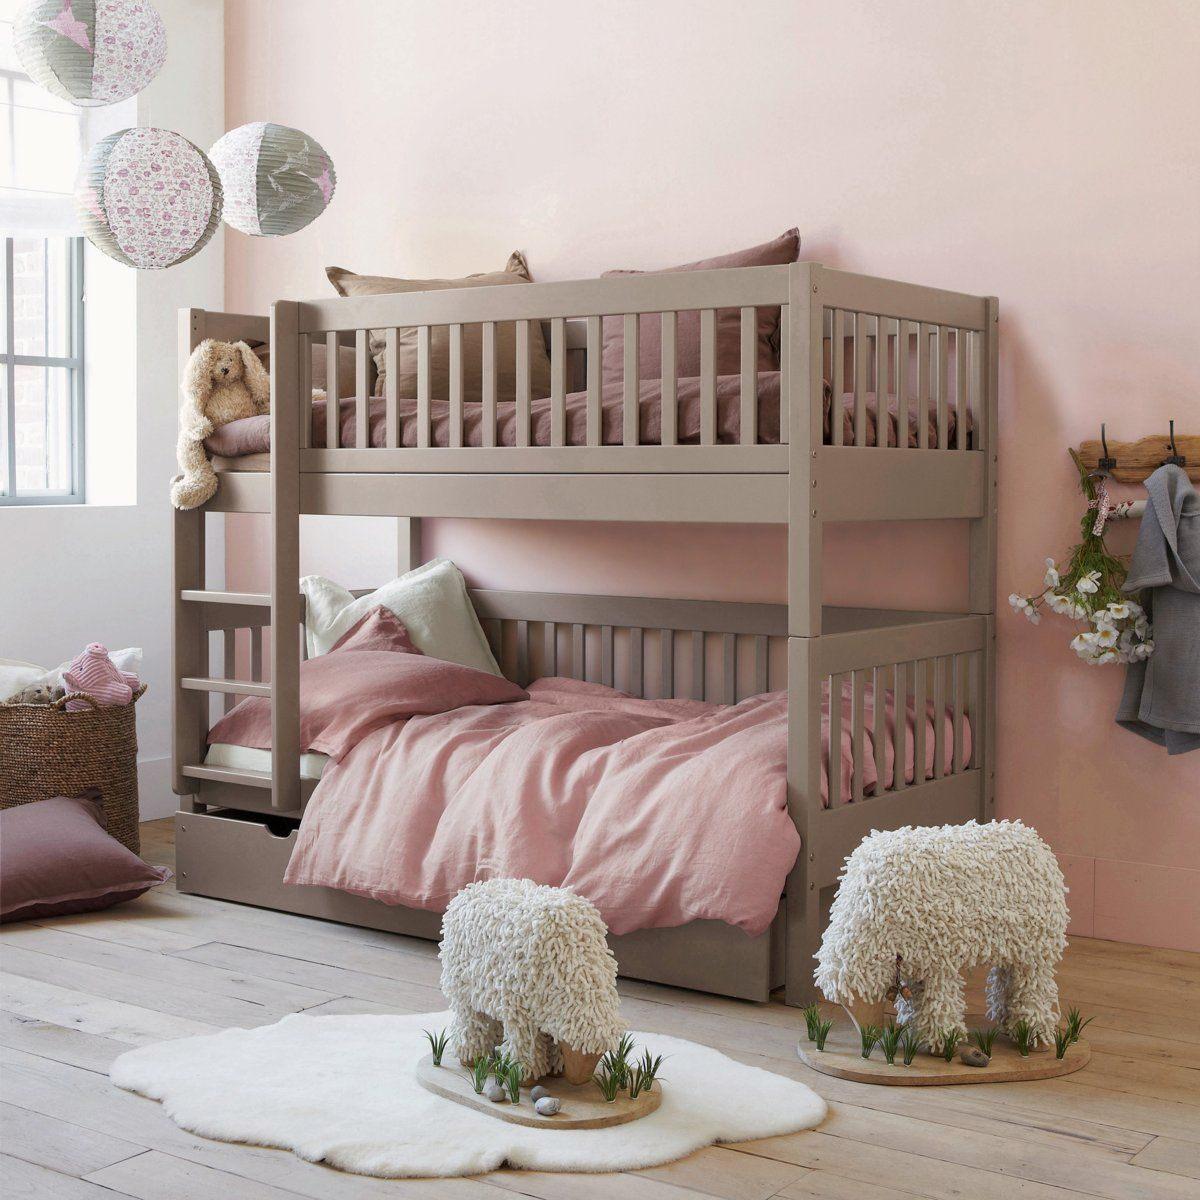 lits superpos s diablotin 5 finitions am pm la redoute. Black Bedroom Furniture Sets. Home Design Ideas